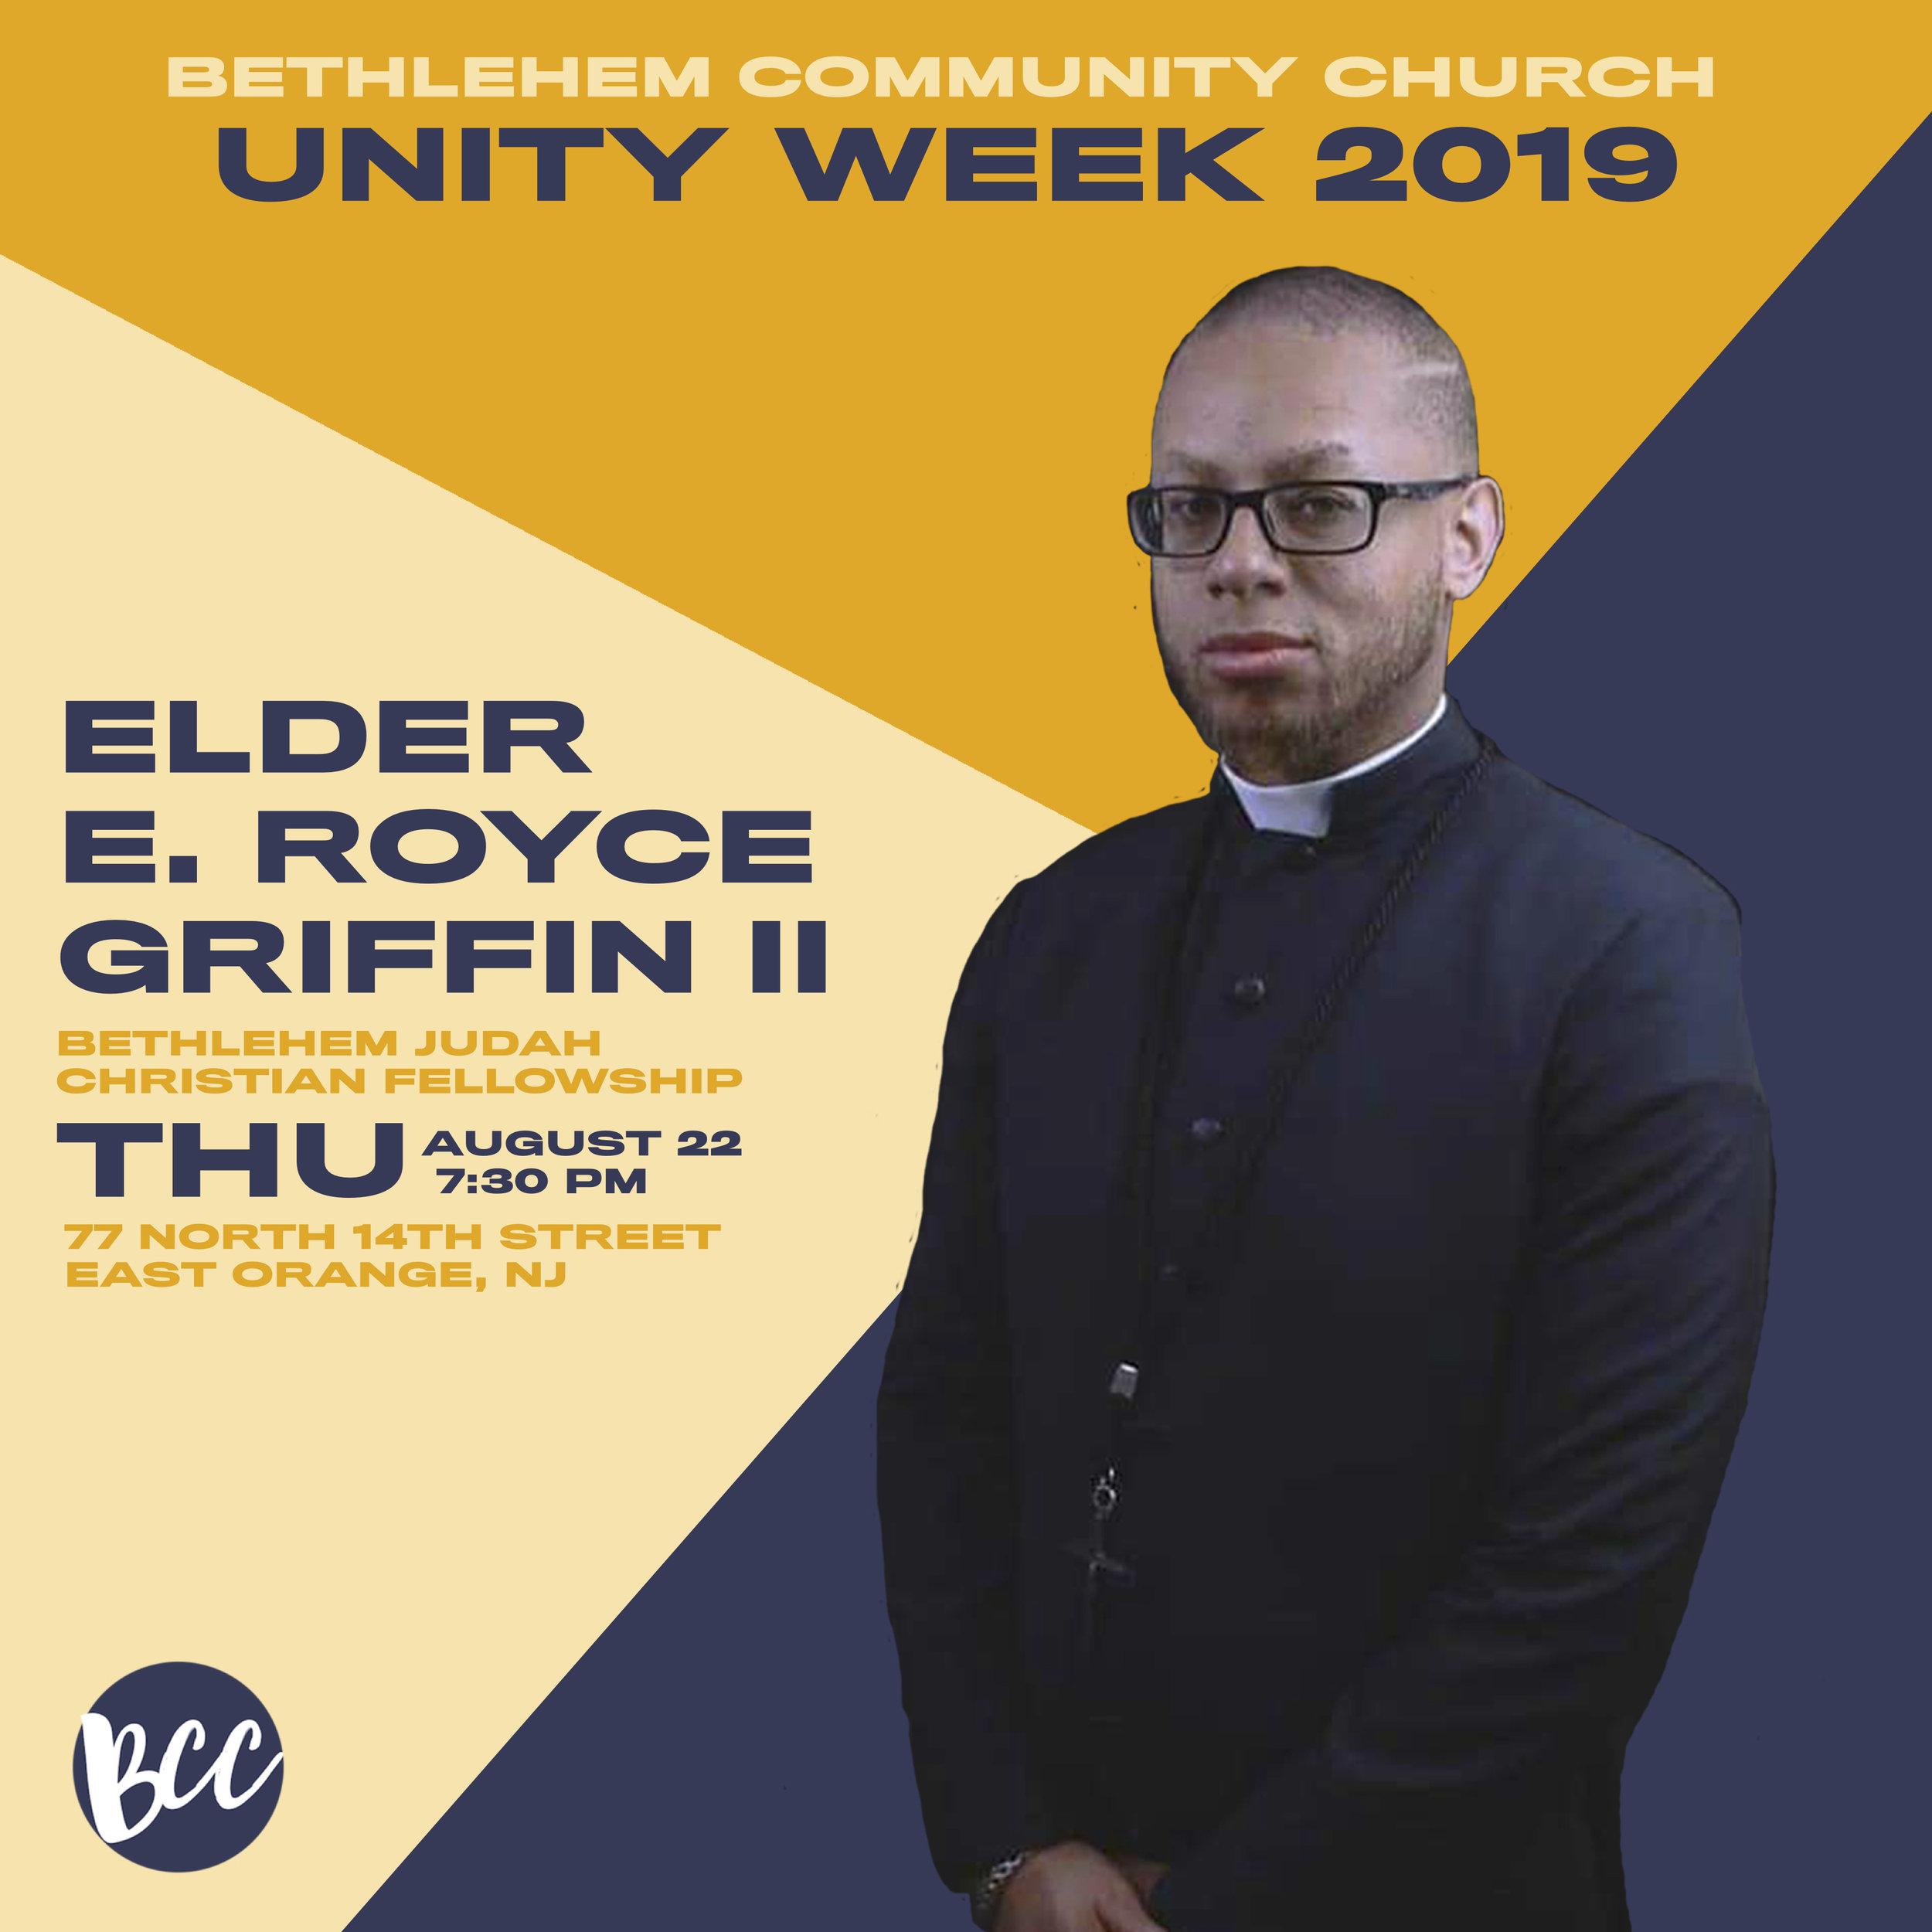 Unity WeekE. Royce Griffin II IG post.jpg